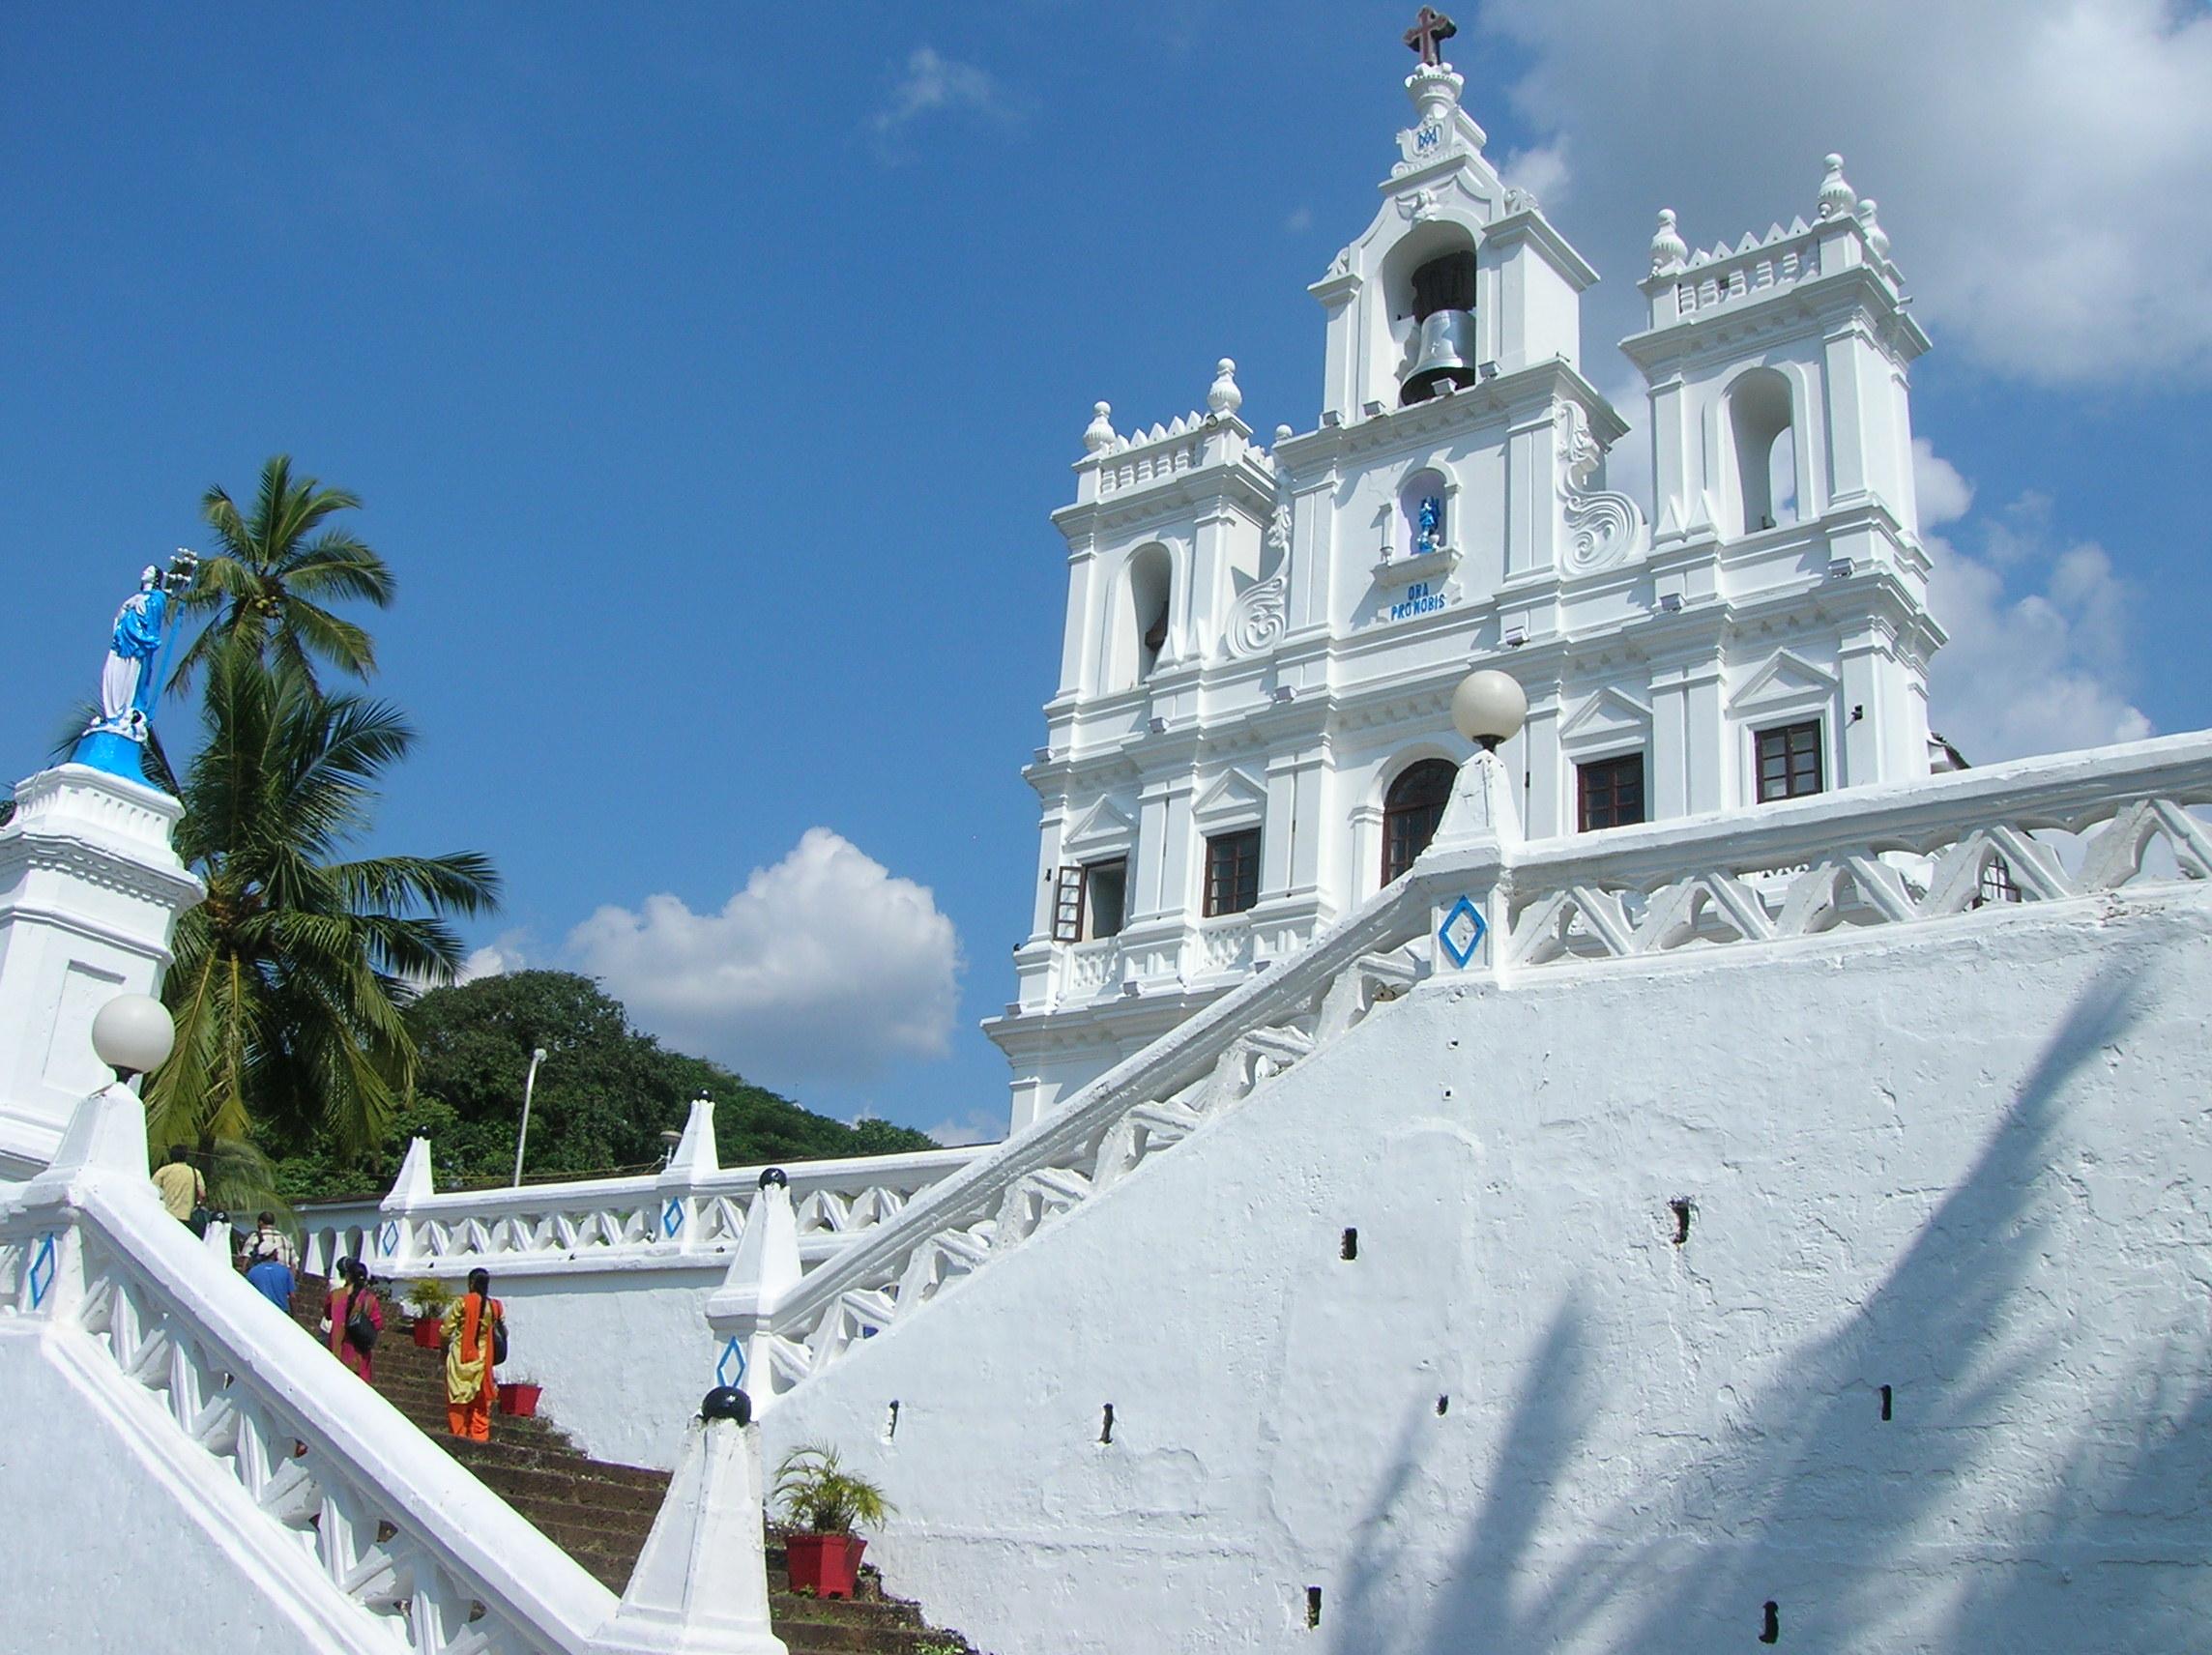 Panjim church, Goa, India (Ulrike Rodrigues)